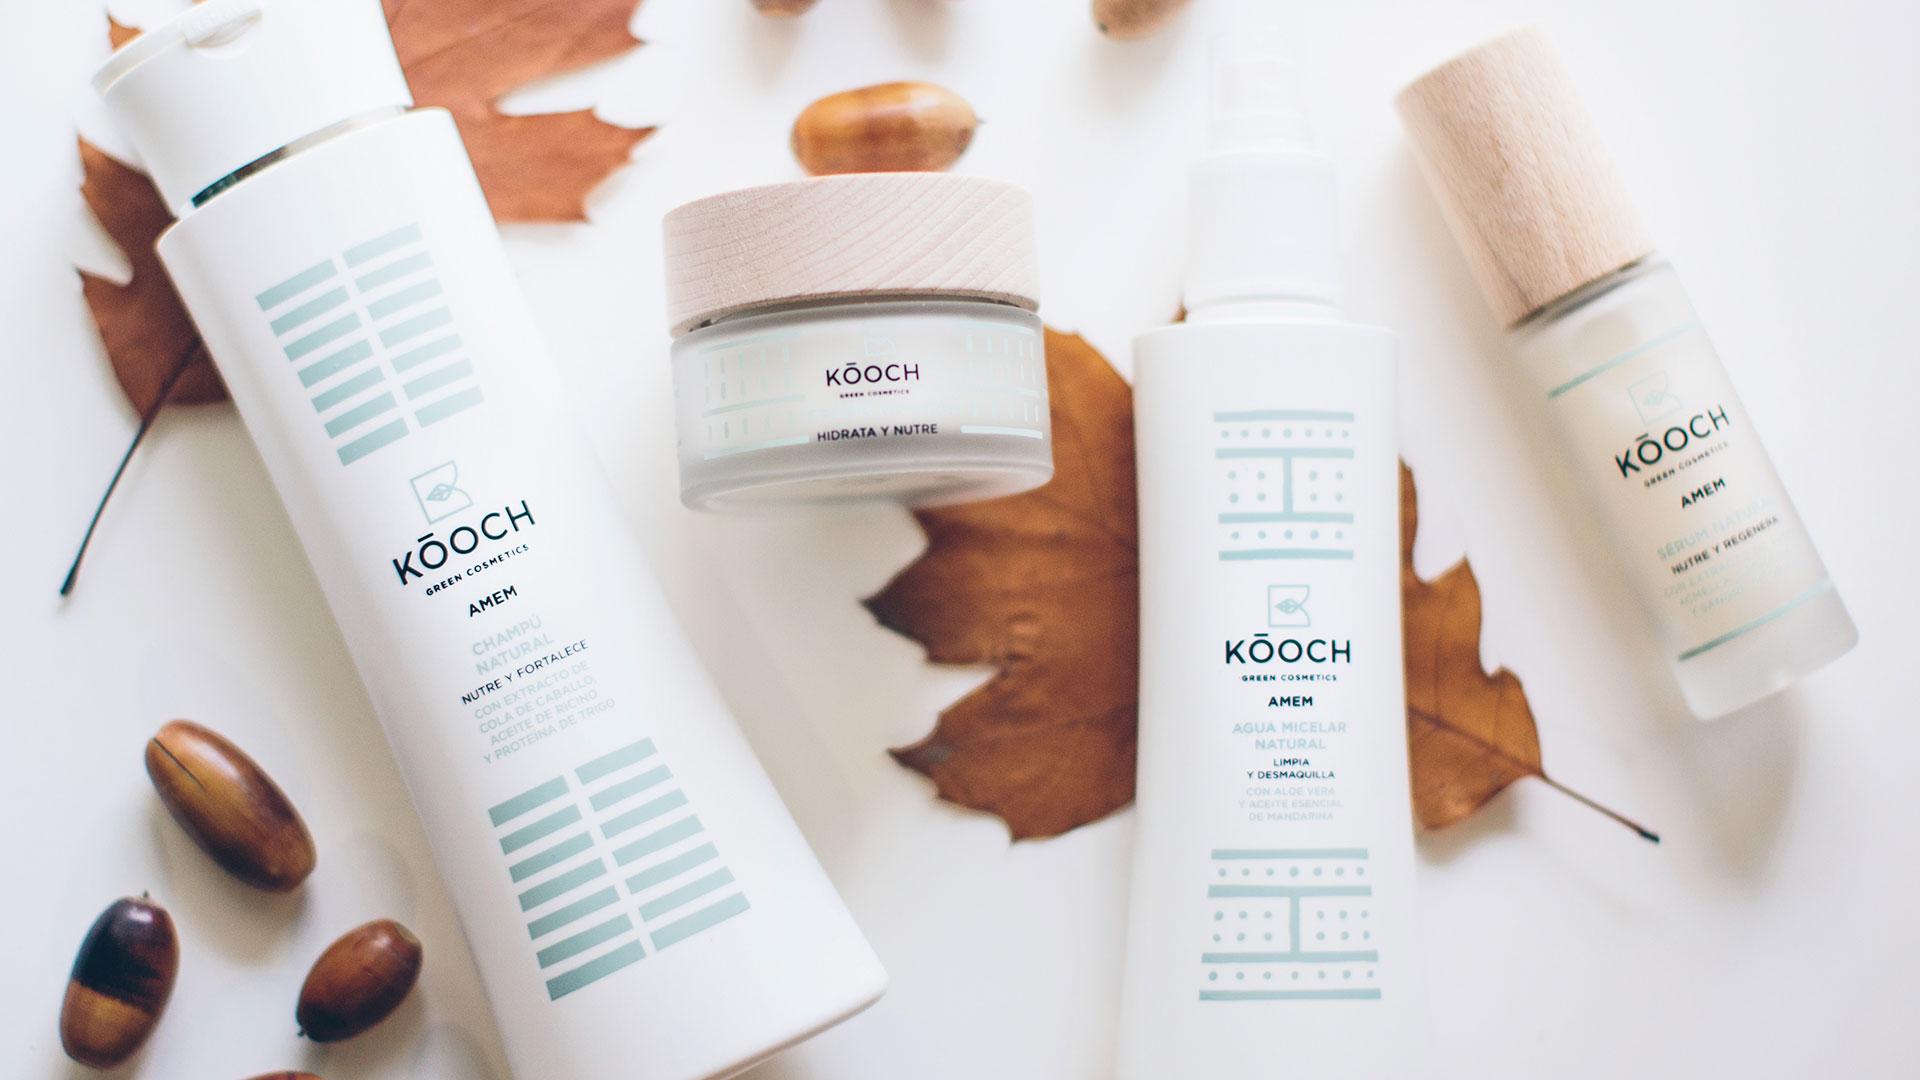 branding-packaging-identidad-kooch-green-cosmetica-sara-quintana-logo-cosmetica-ecologica-9